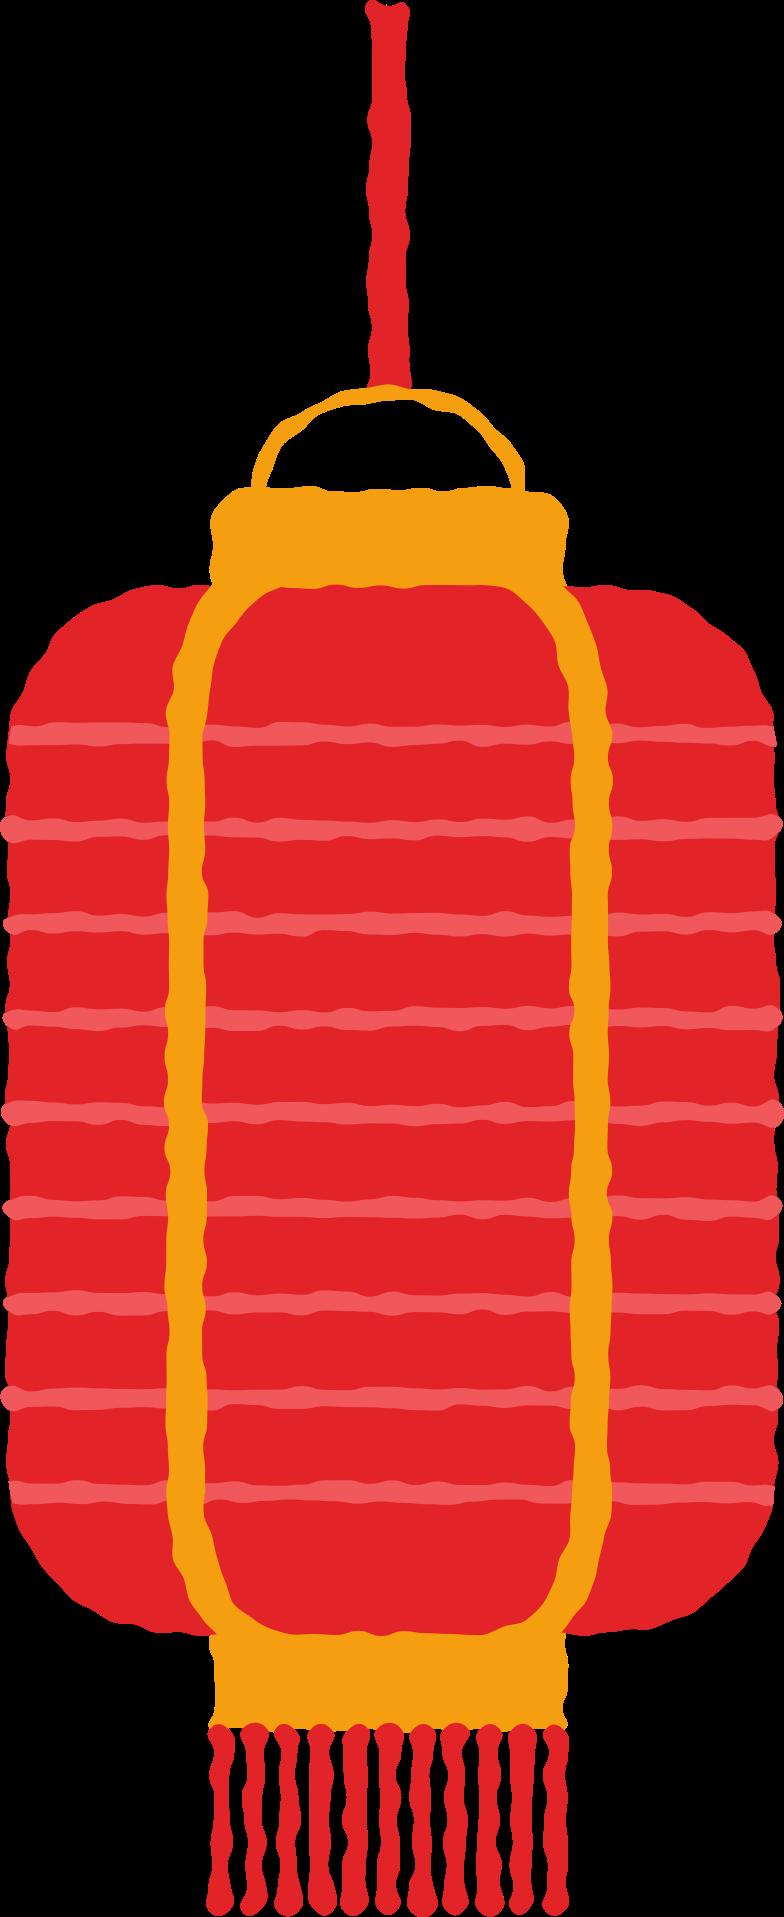 lantern rectangle with fringe Clipart illustration in PNG, SVG